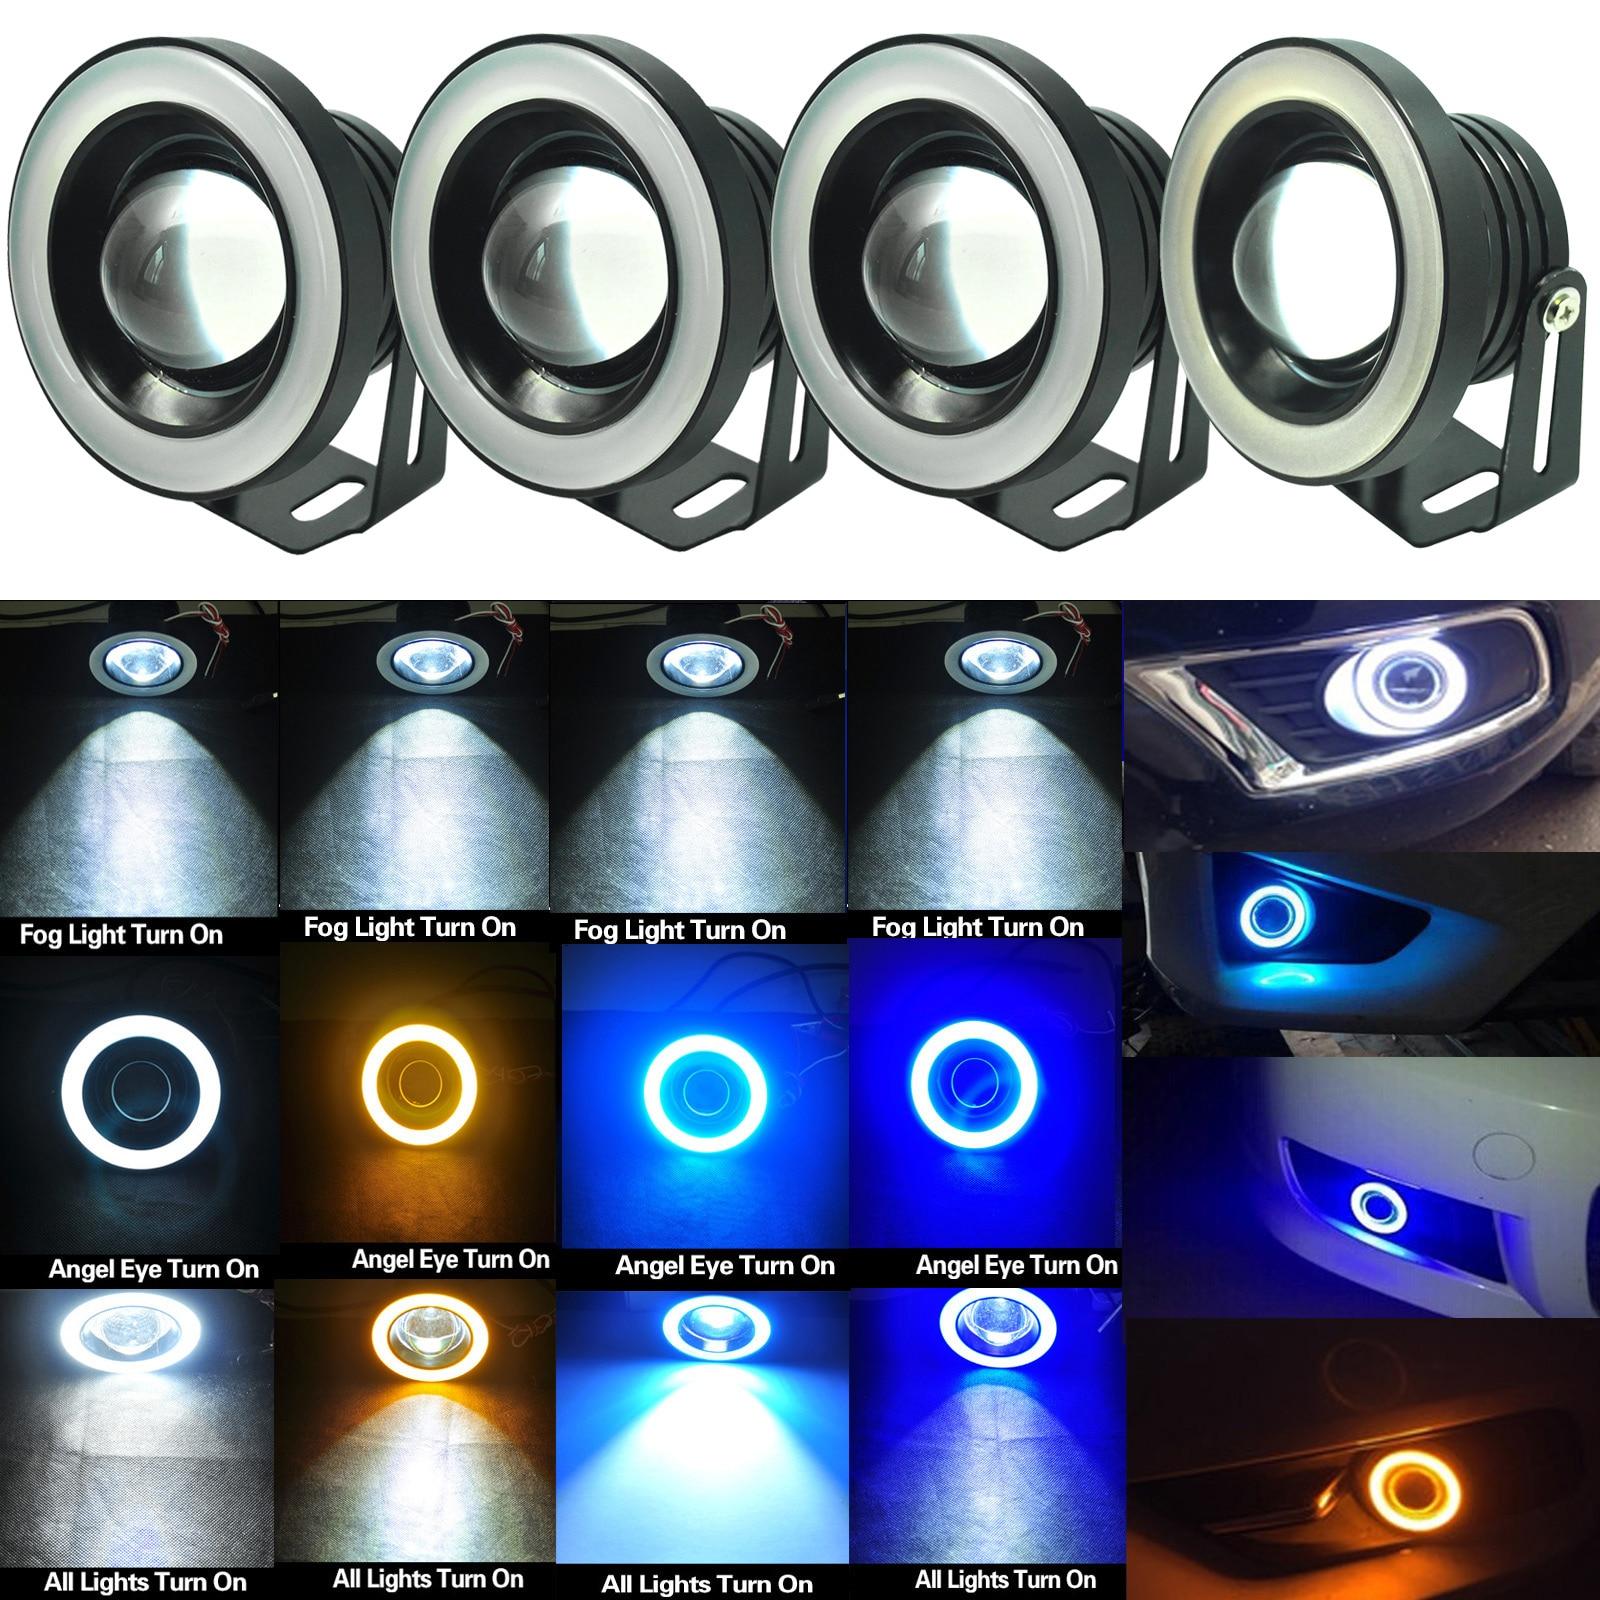 Do Promotion! 1pair 3.5inch Car COB LED Fog Driving Light Projector Tube Halo Angel Eyes DRL Bulbs 88